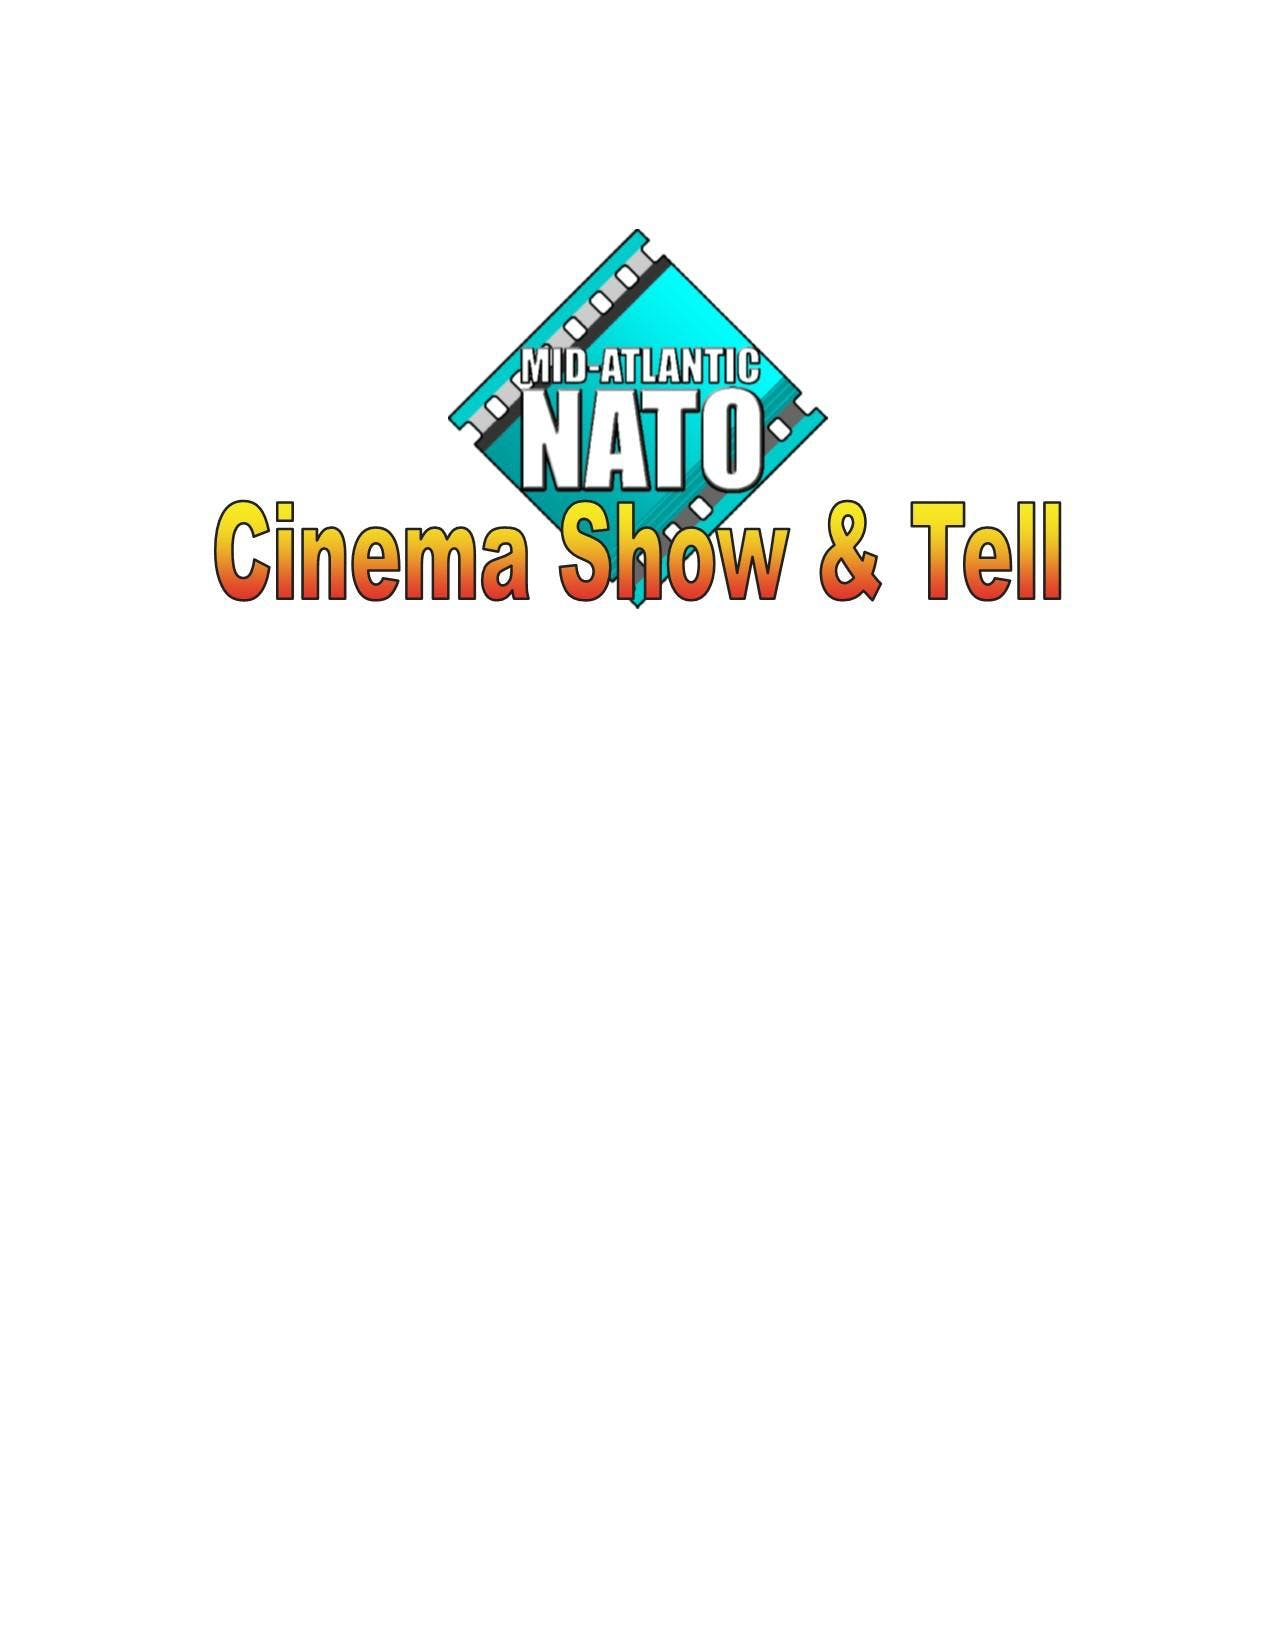 Mid-Atlantic NATO &quotCinema Show &amp Tell&quot 2018   Theatre Representatives Registration Page